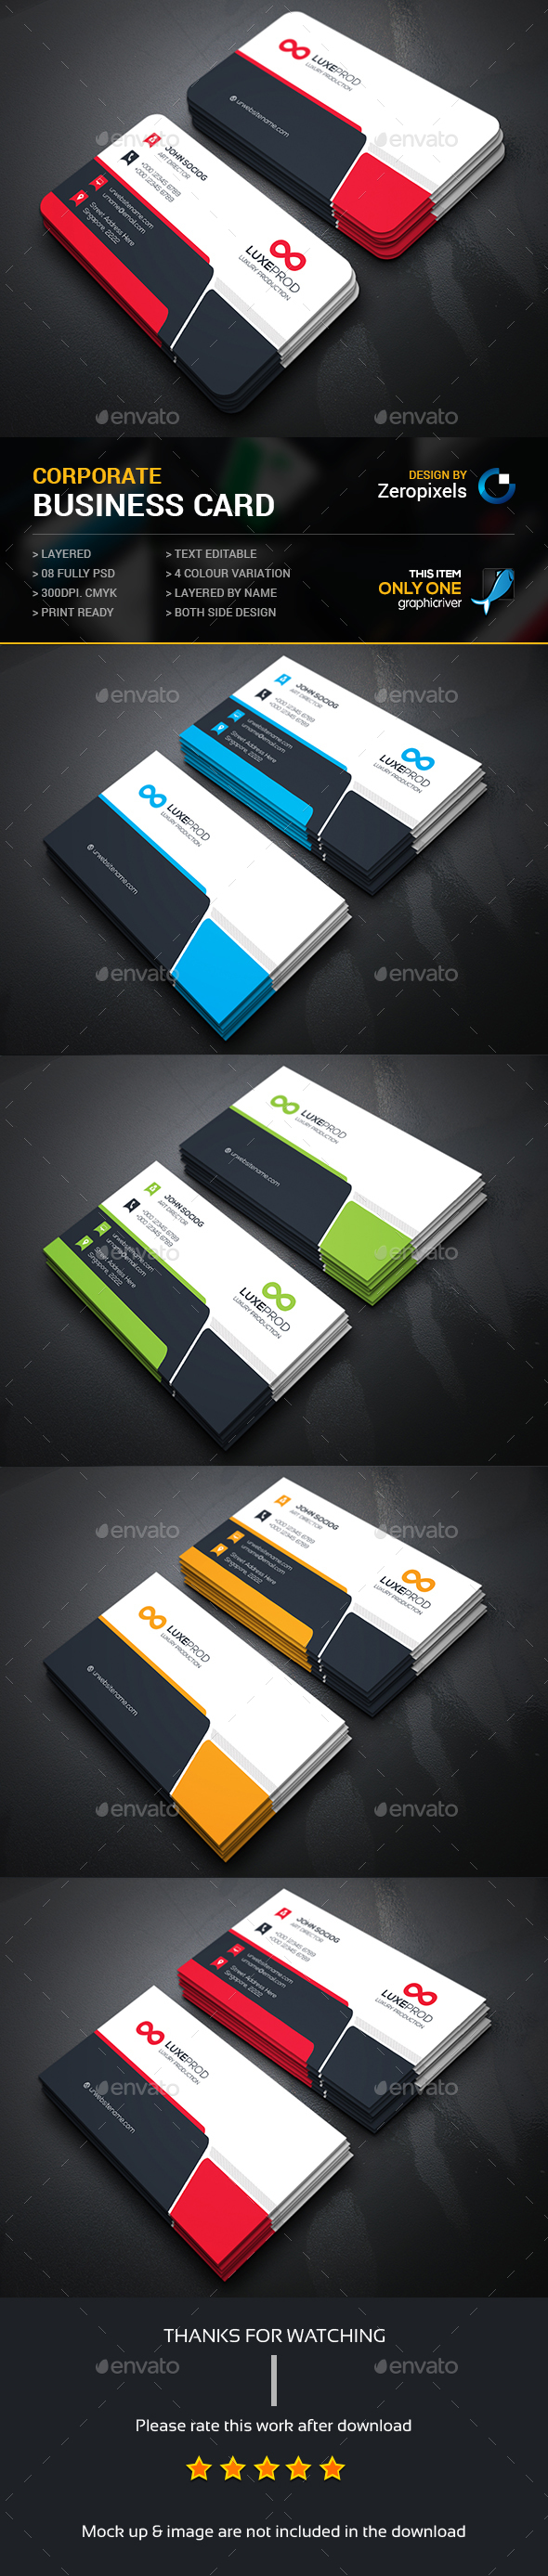 Corporate business card negcios pinterest cartes de visita corporate business card reheart Images